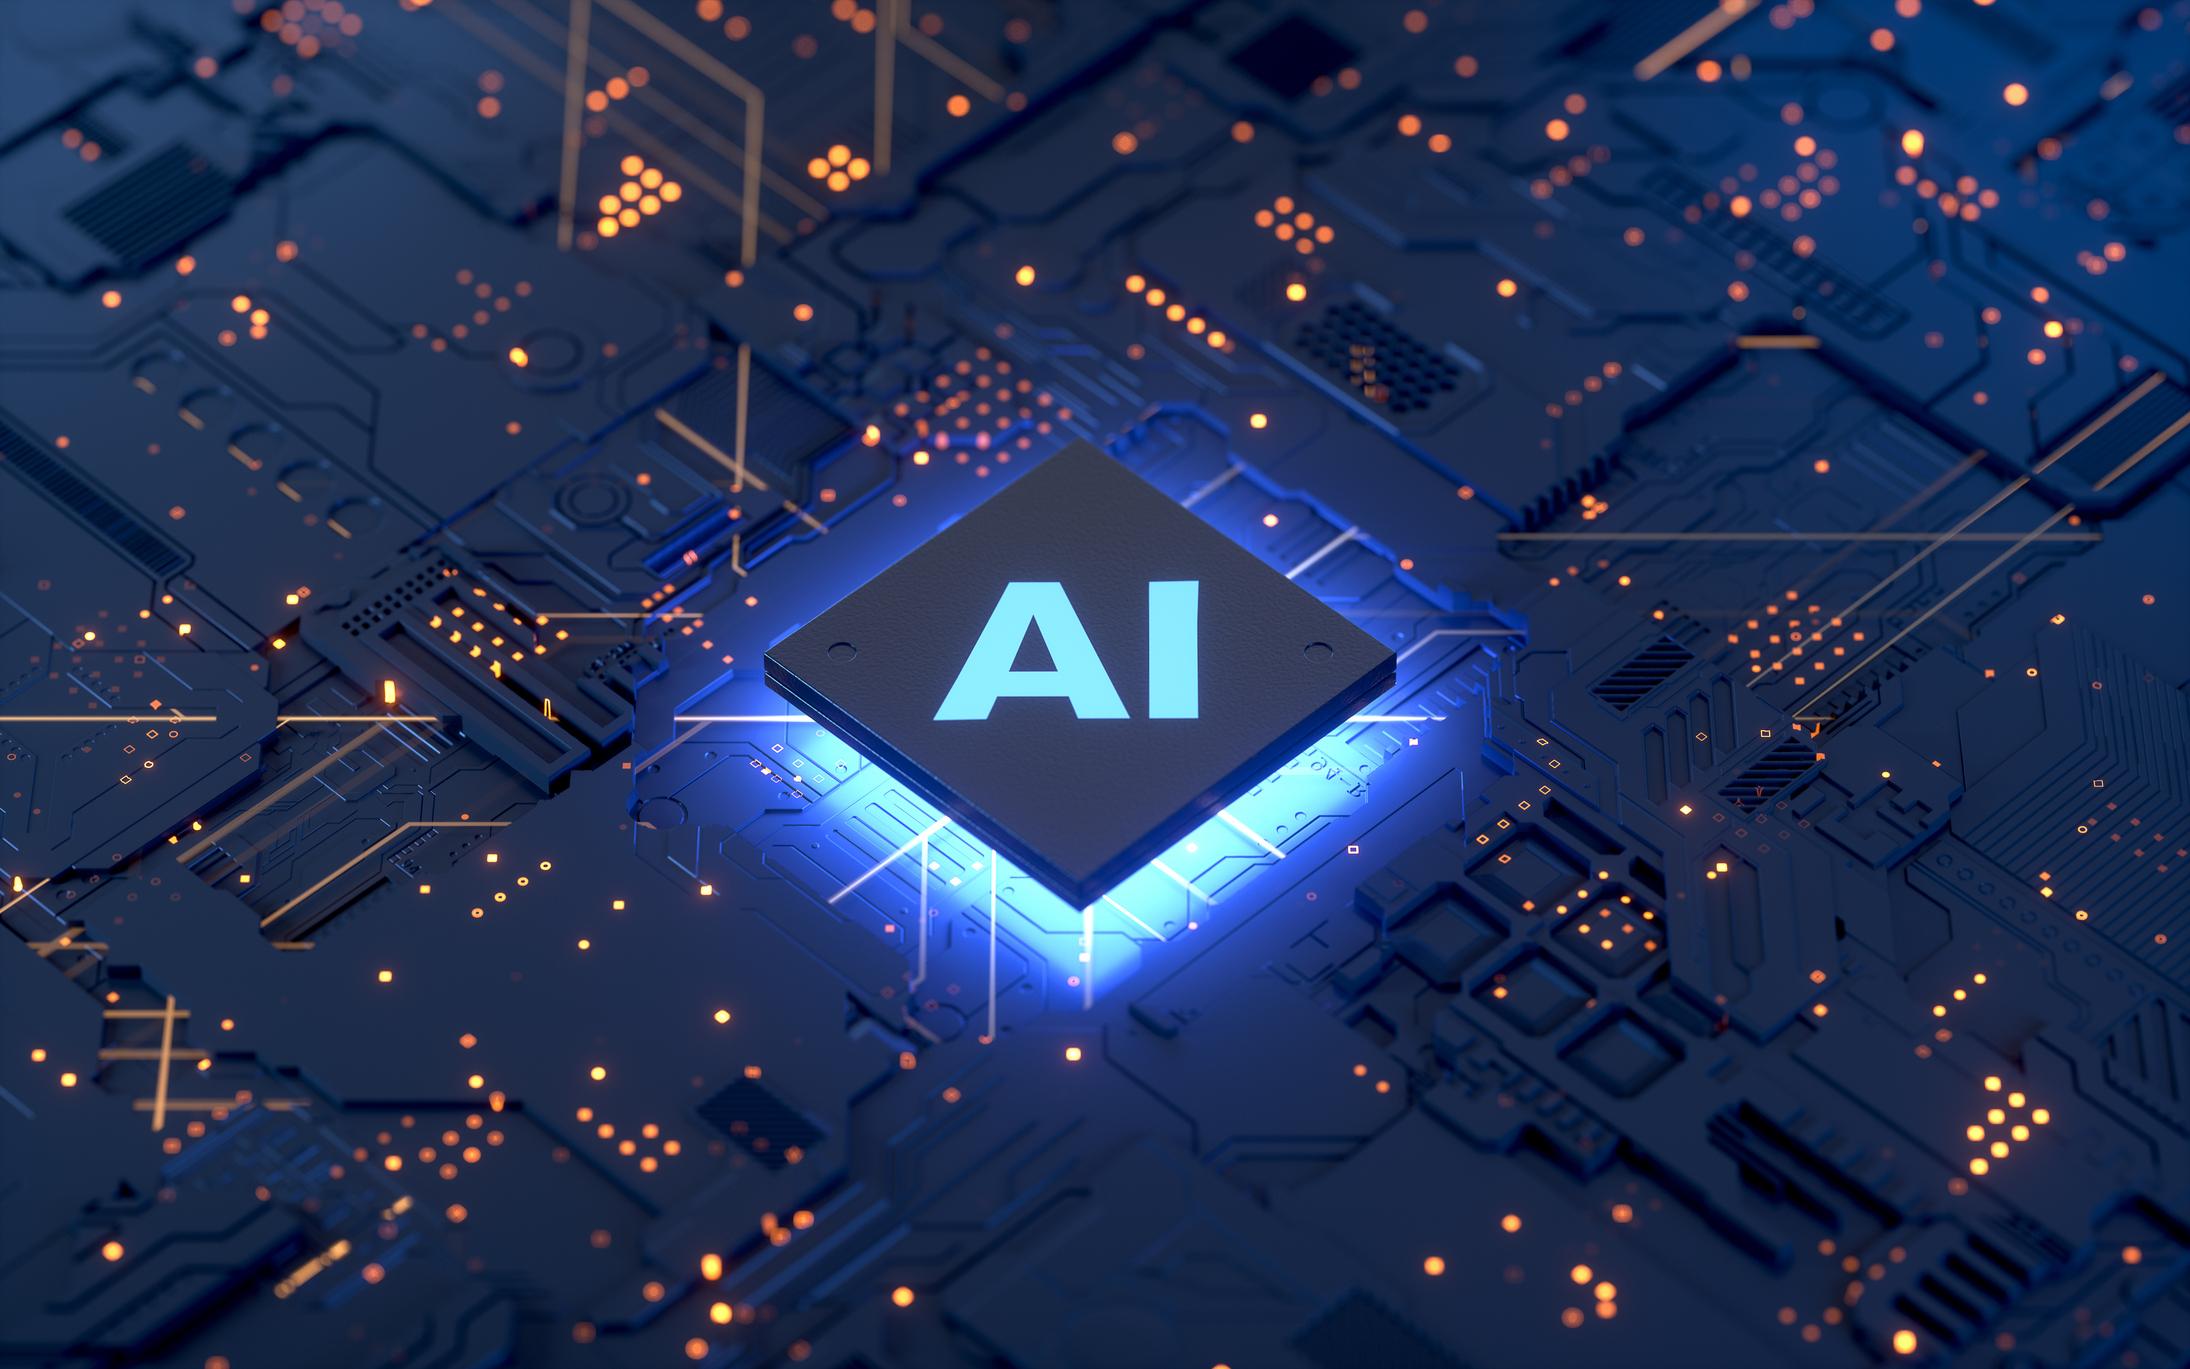 PULSEROLLER's Advanced Intelligence Technology